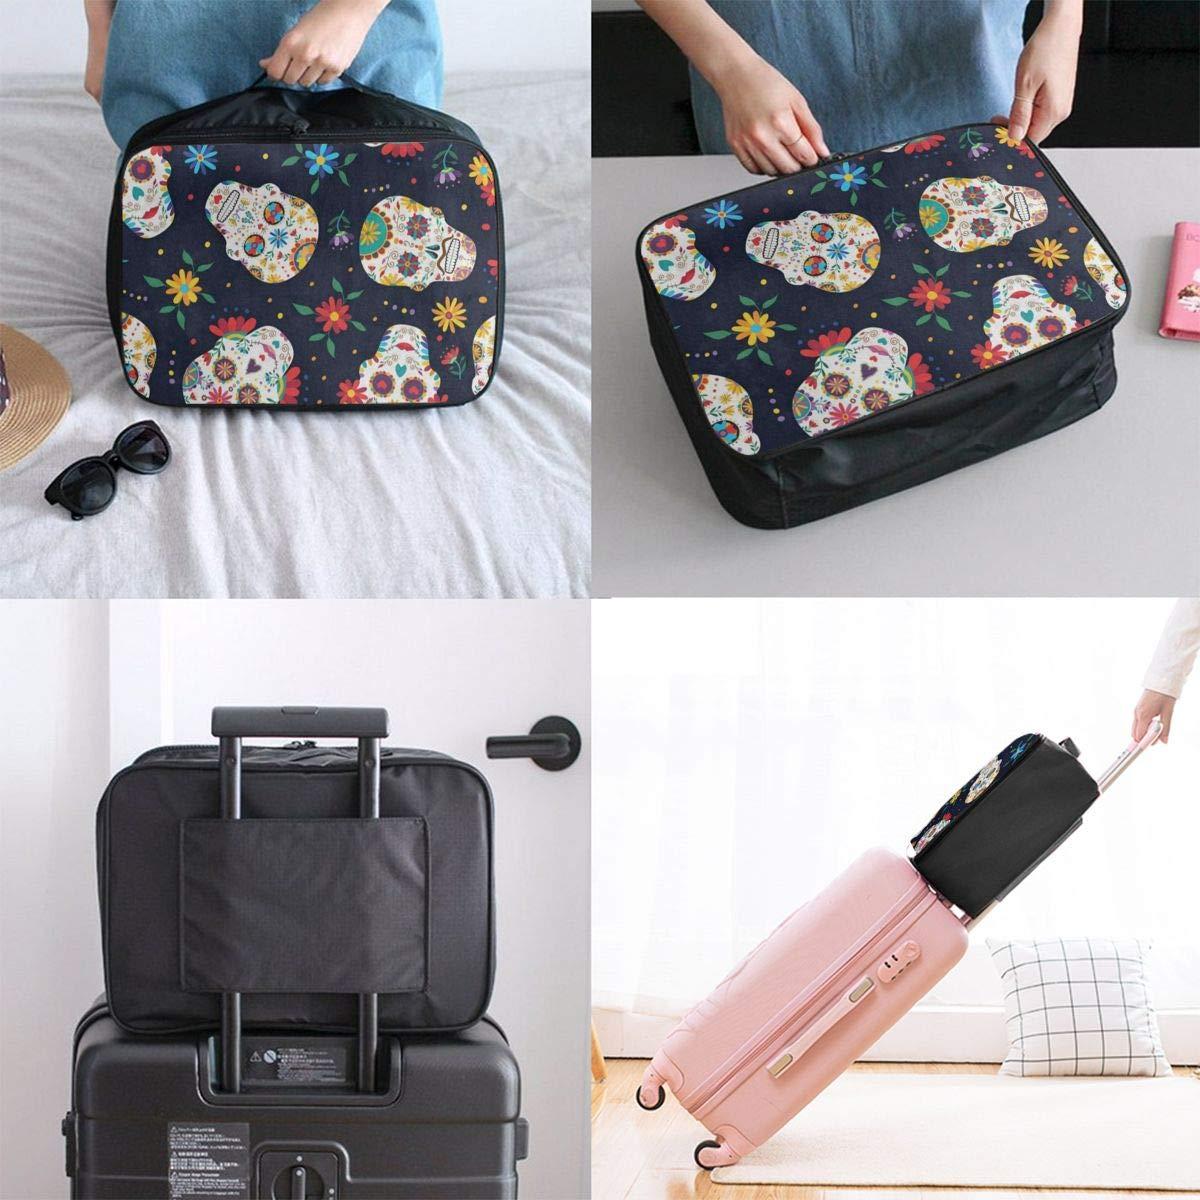 Luggage Bag Travel Duffel Bag Waterproof Summer Beach Ocean Palm Tree Guitar Lightweight Large Capacity Portable Storage Bag